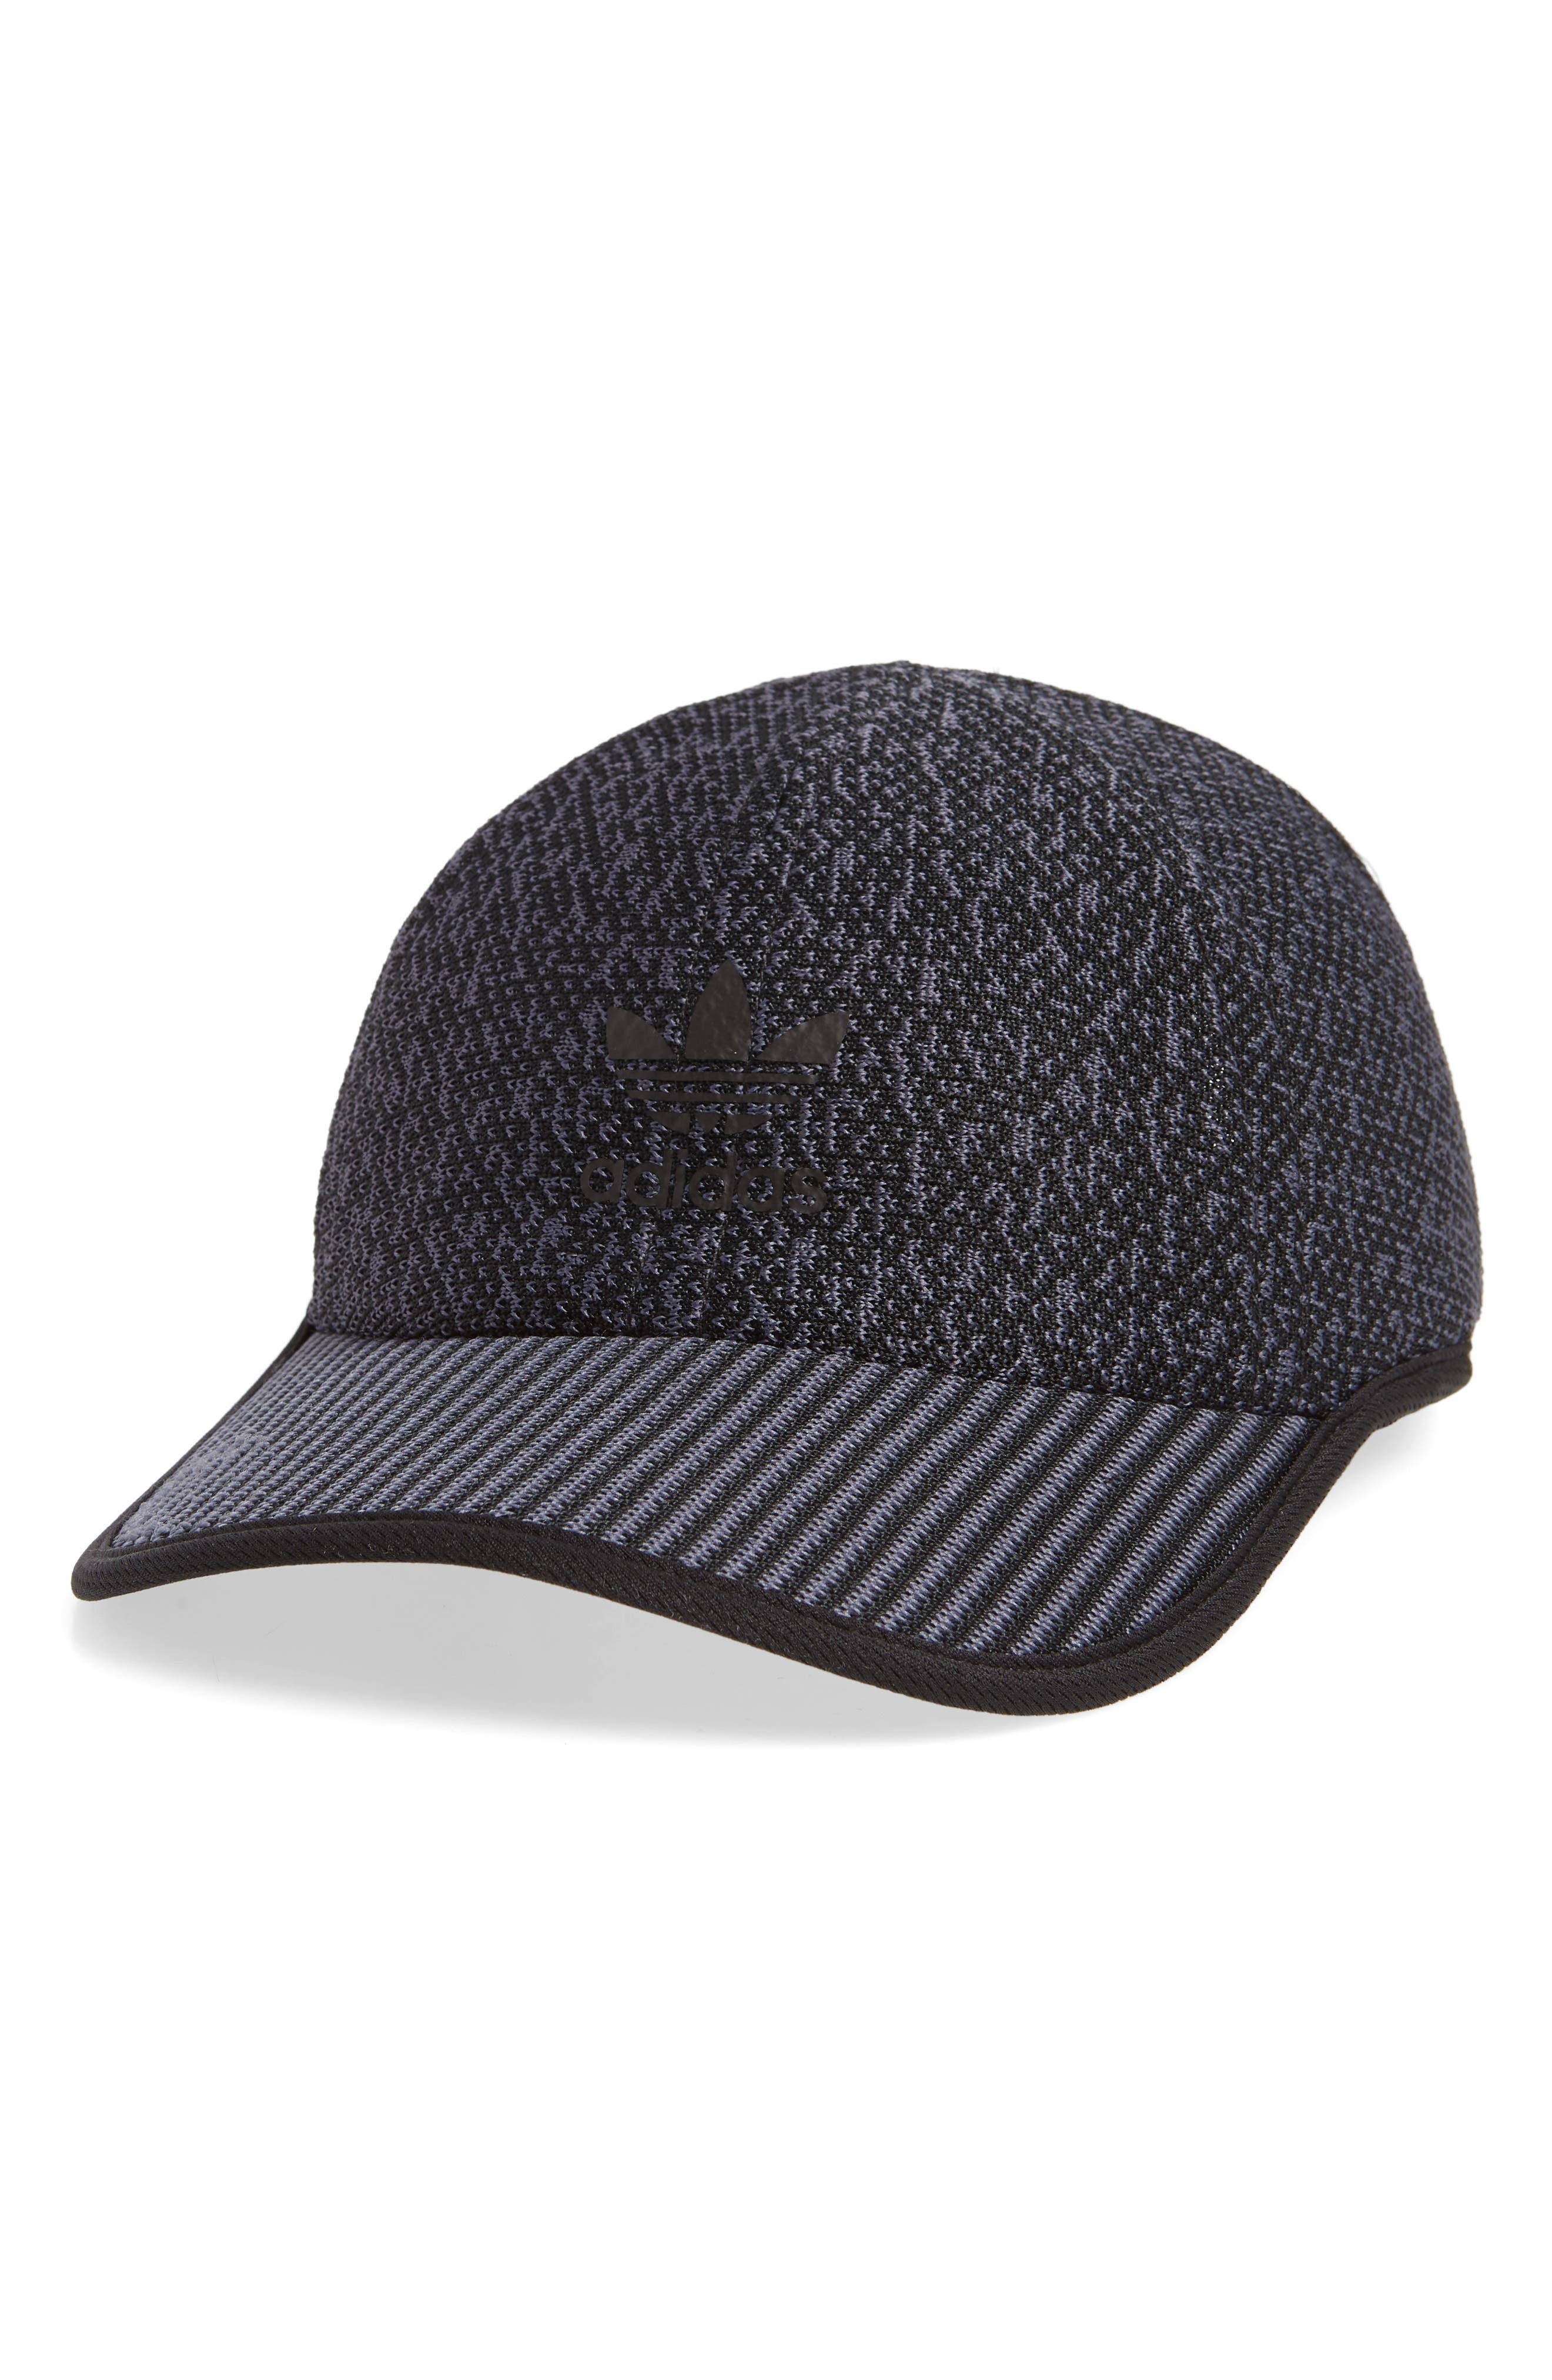 Primeknit II Baseball Cap,                             Main thumbnail 1, color,                             BLACK/ ONIX